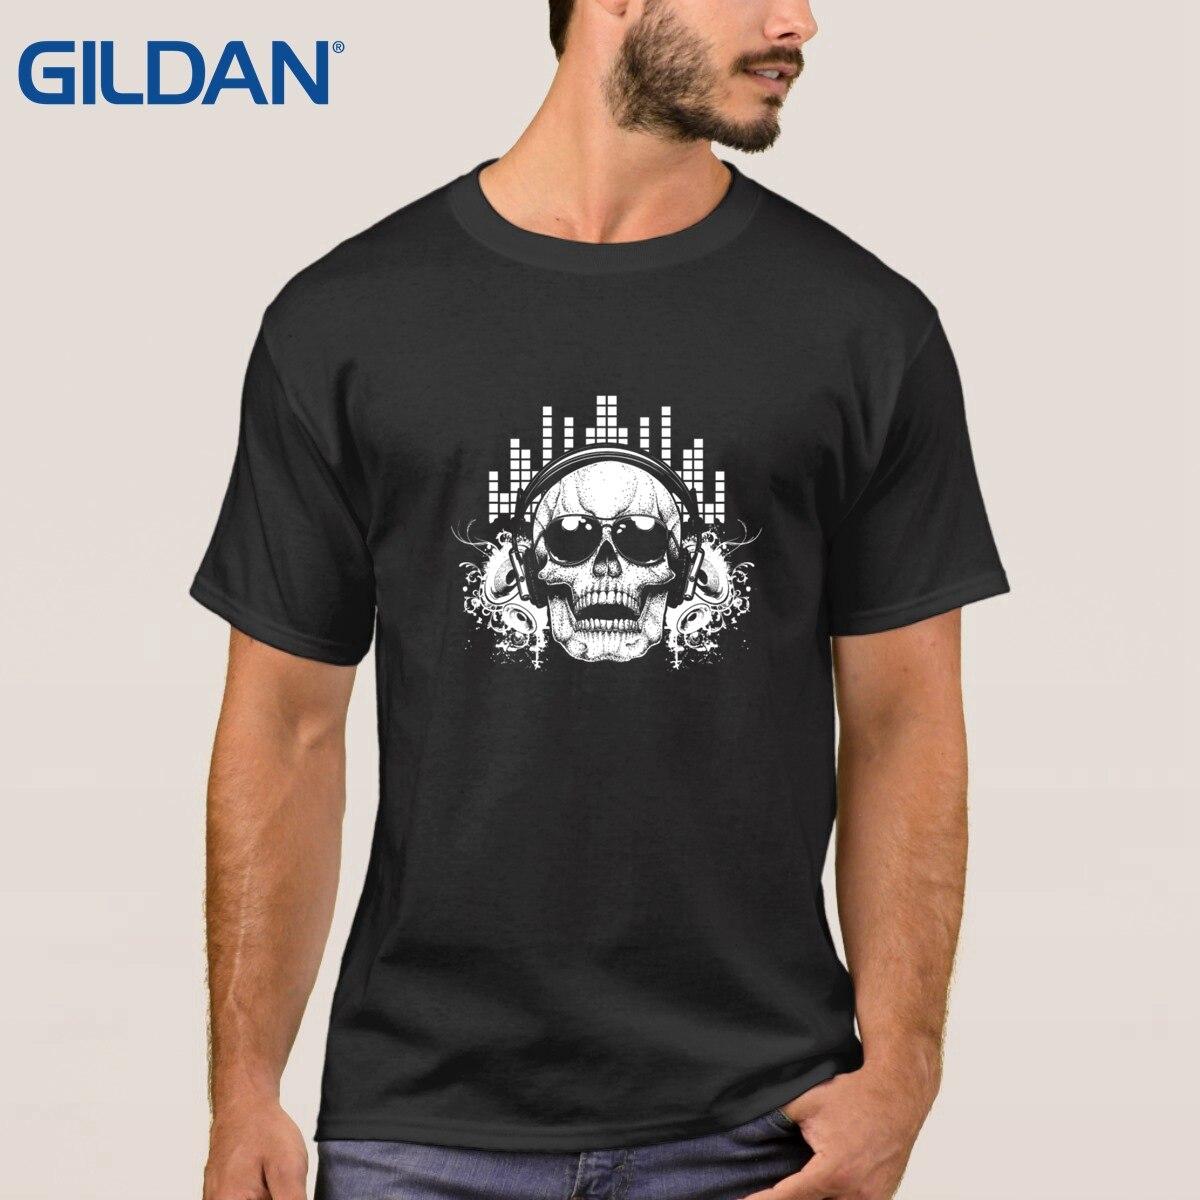 Star Wars Darth Vader Dj Top Quality For Men Blue Ali T Shirts Hight Tee Shirt Short Sleeves Homme Shirts 100% Cotton